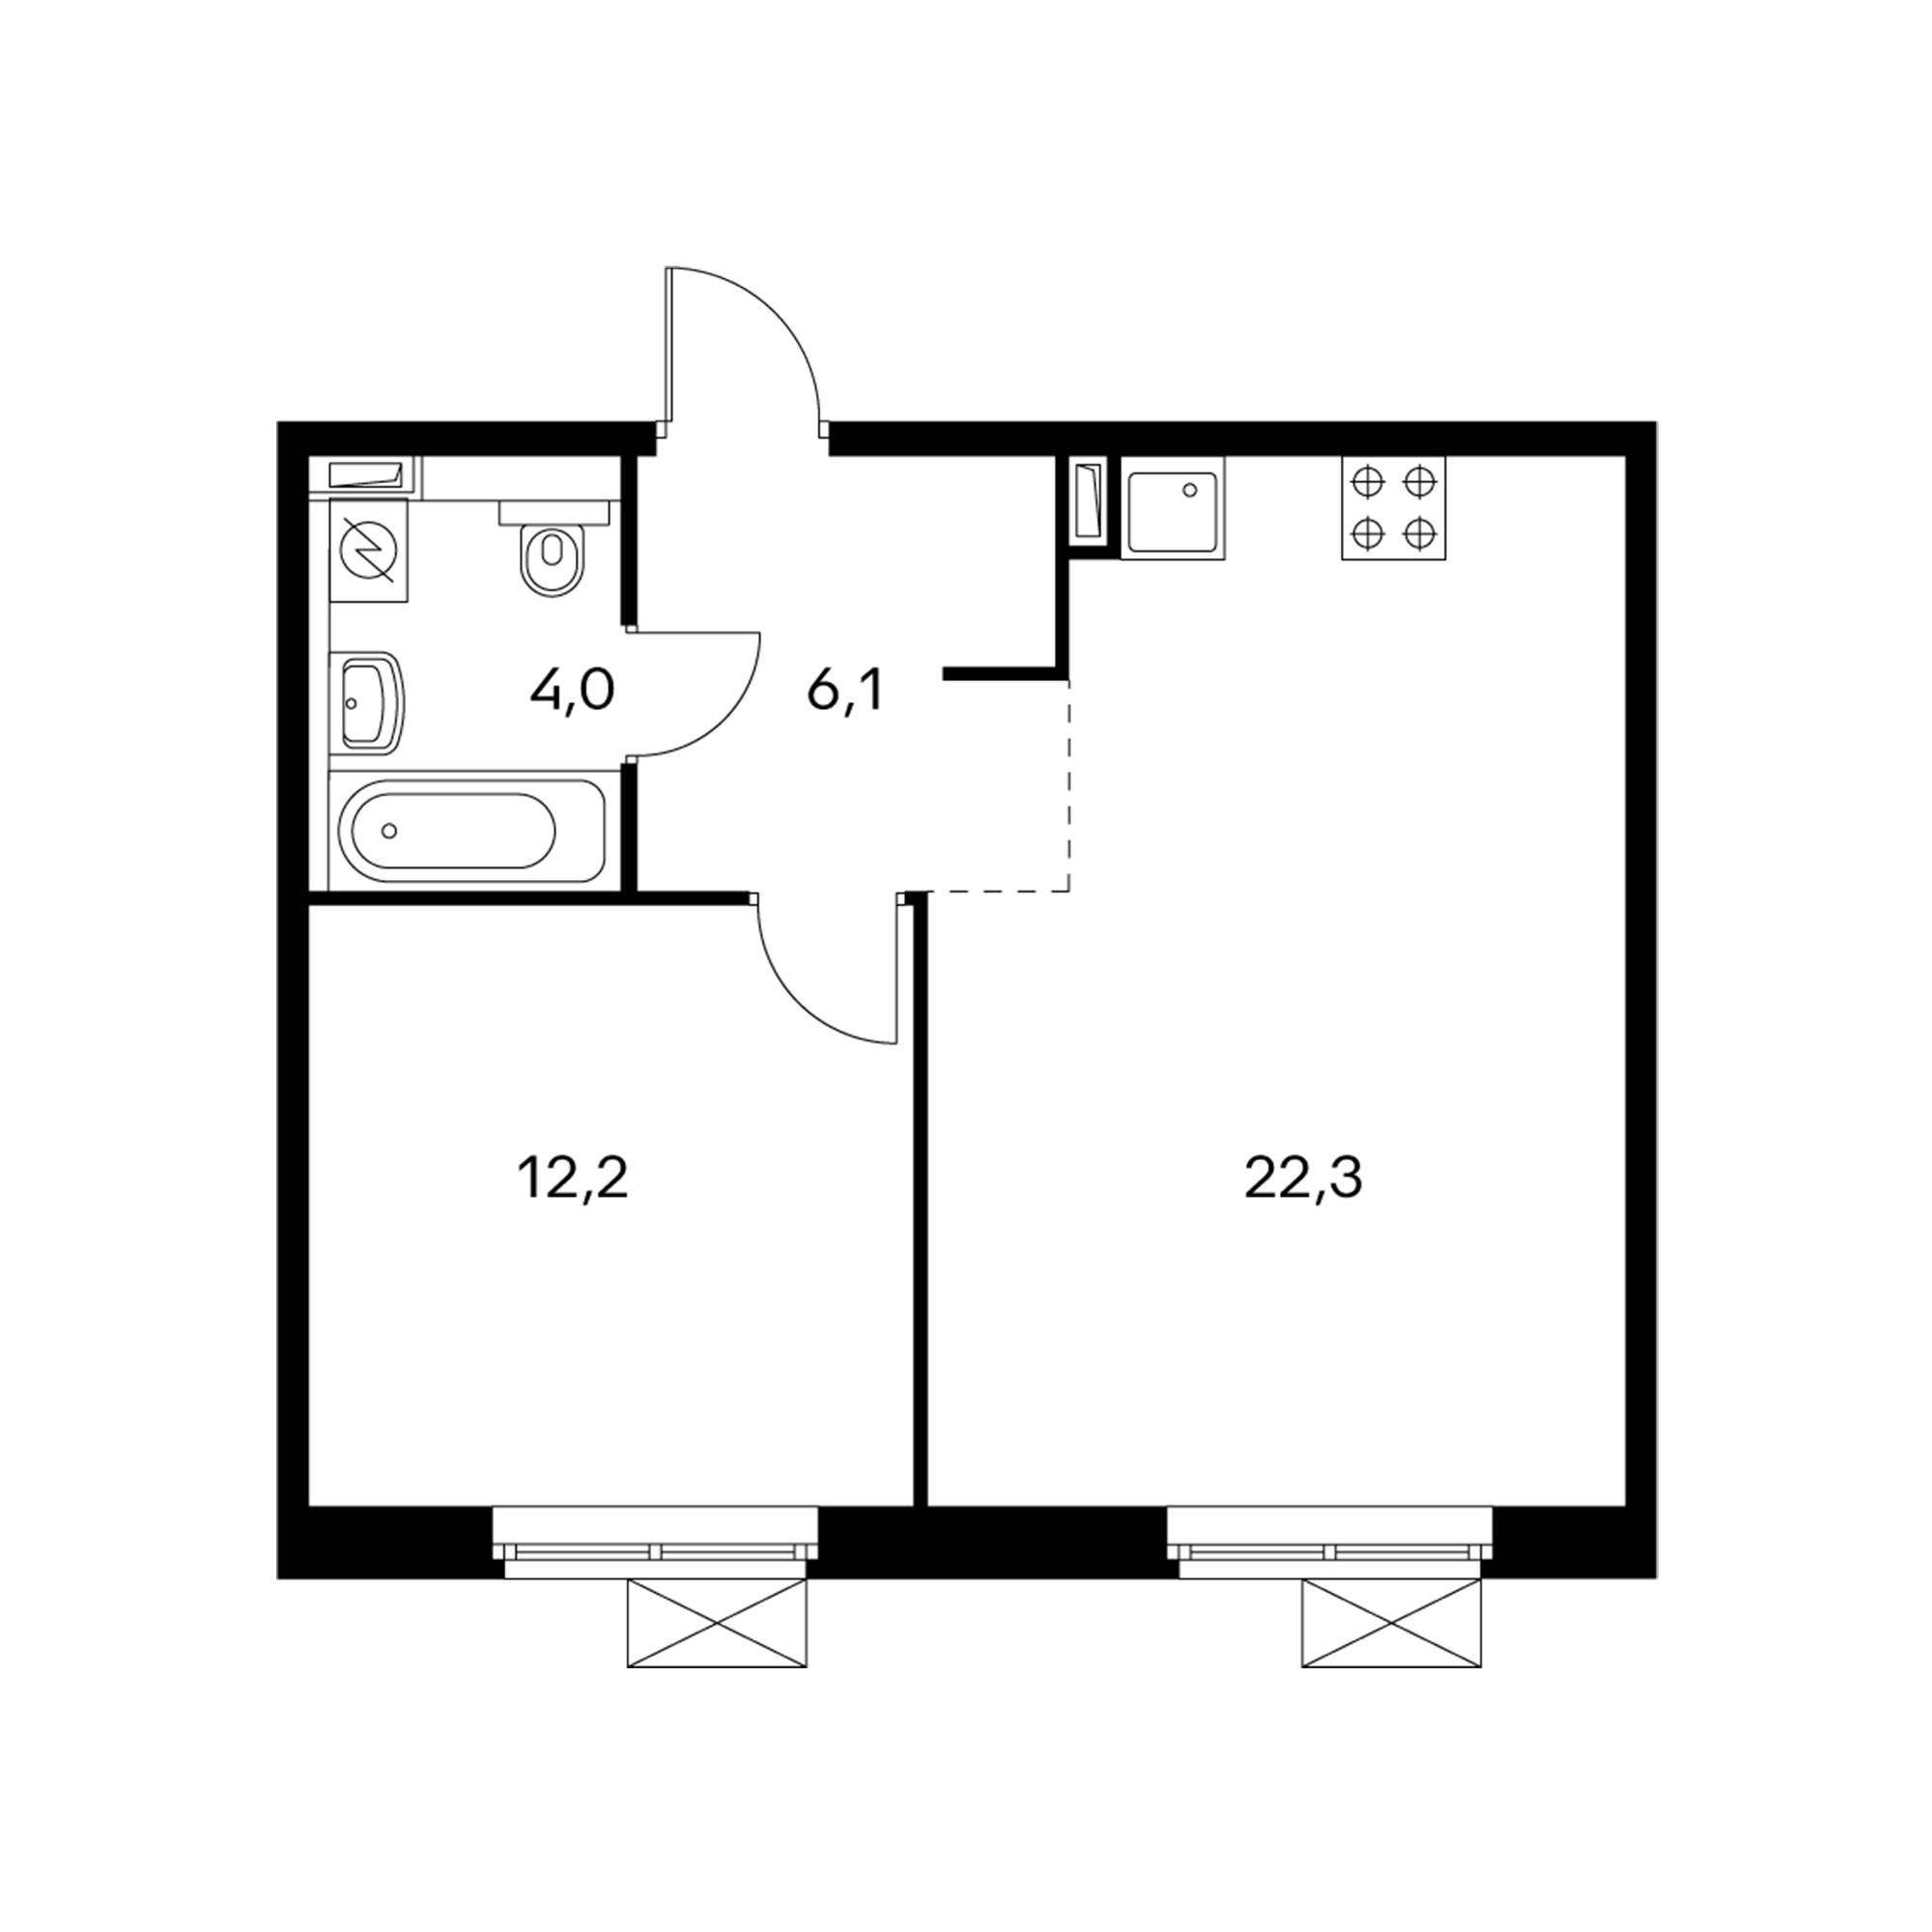 1EL5_7.8-1*